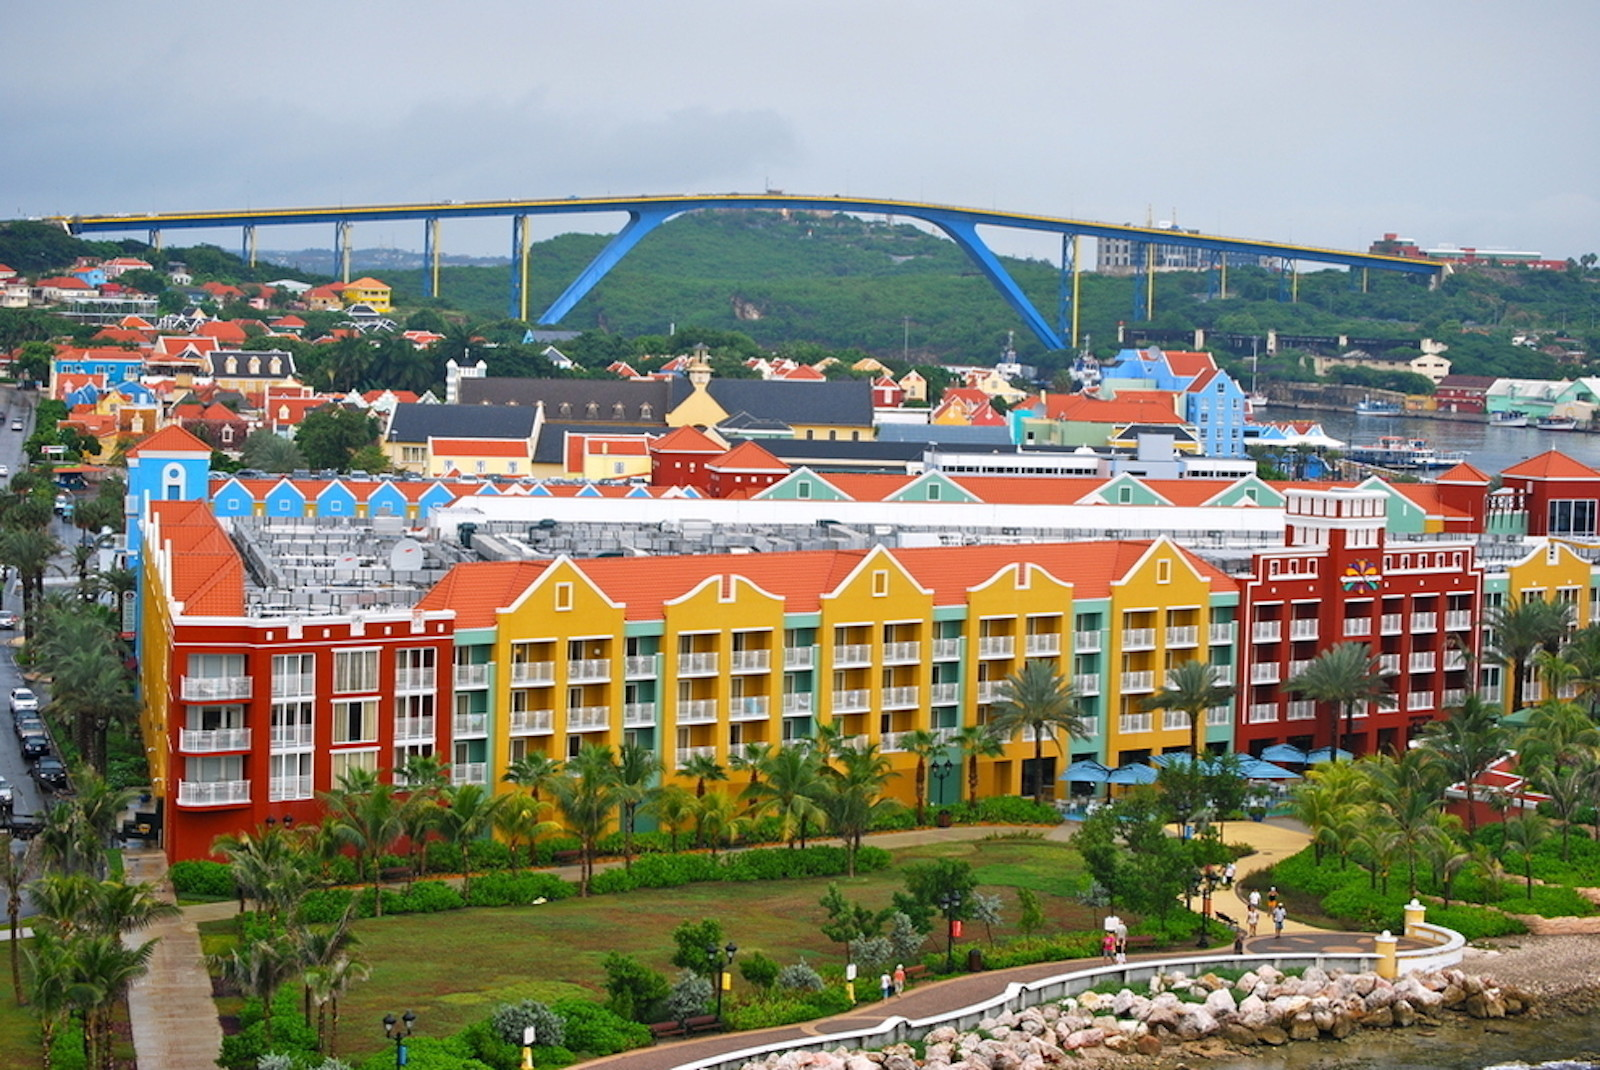 Willemstad, Curacao, Caribbean